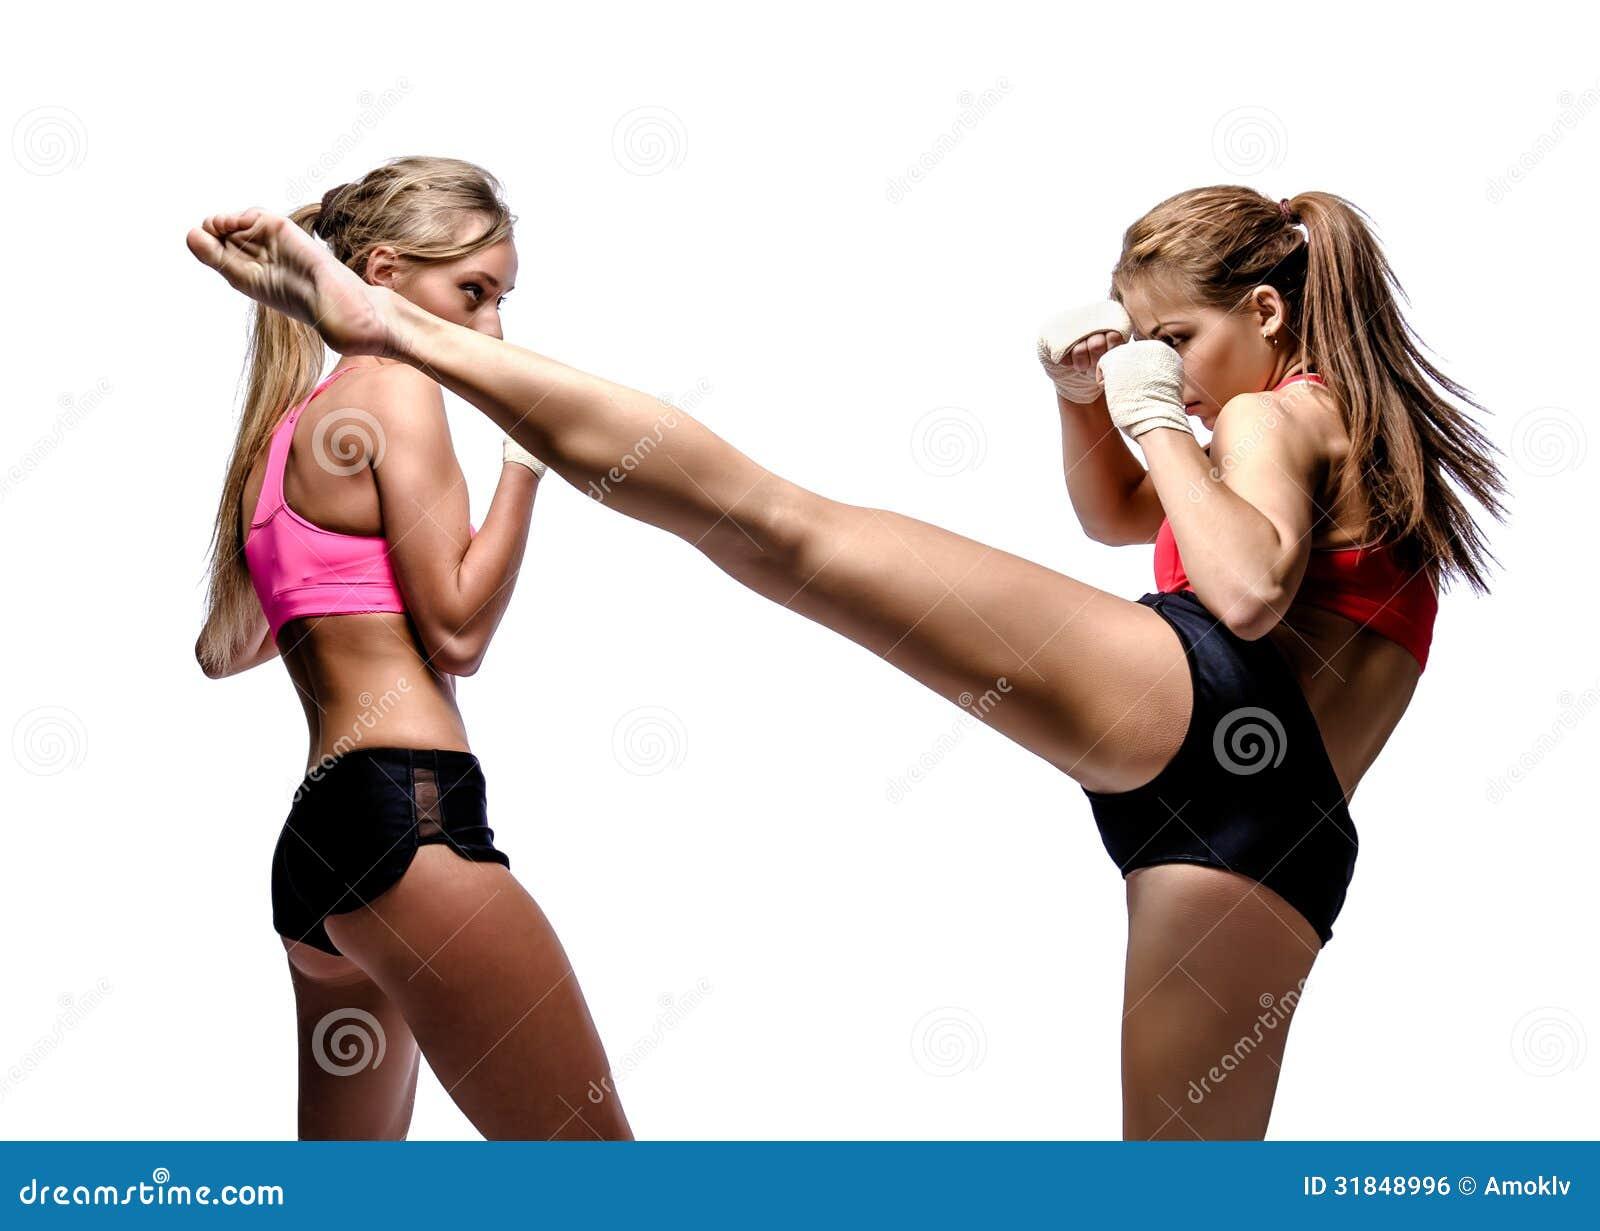 Two girl fighting thx. ;-)